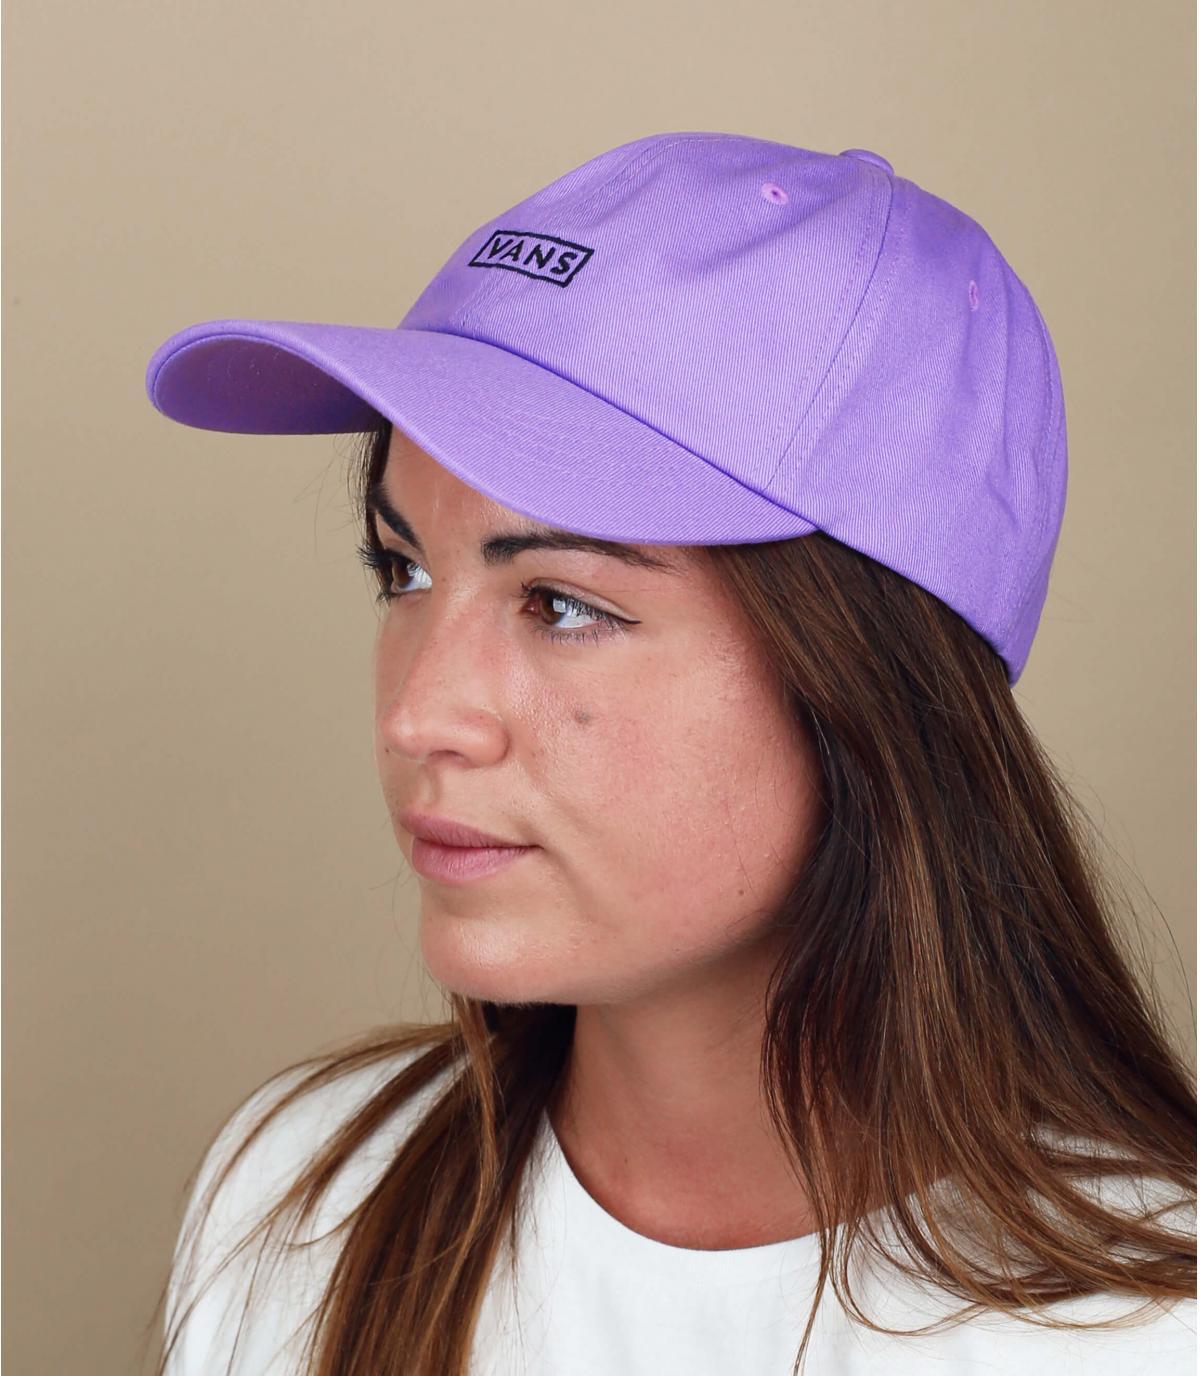 cappellino Vans donna viola